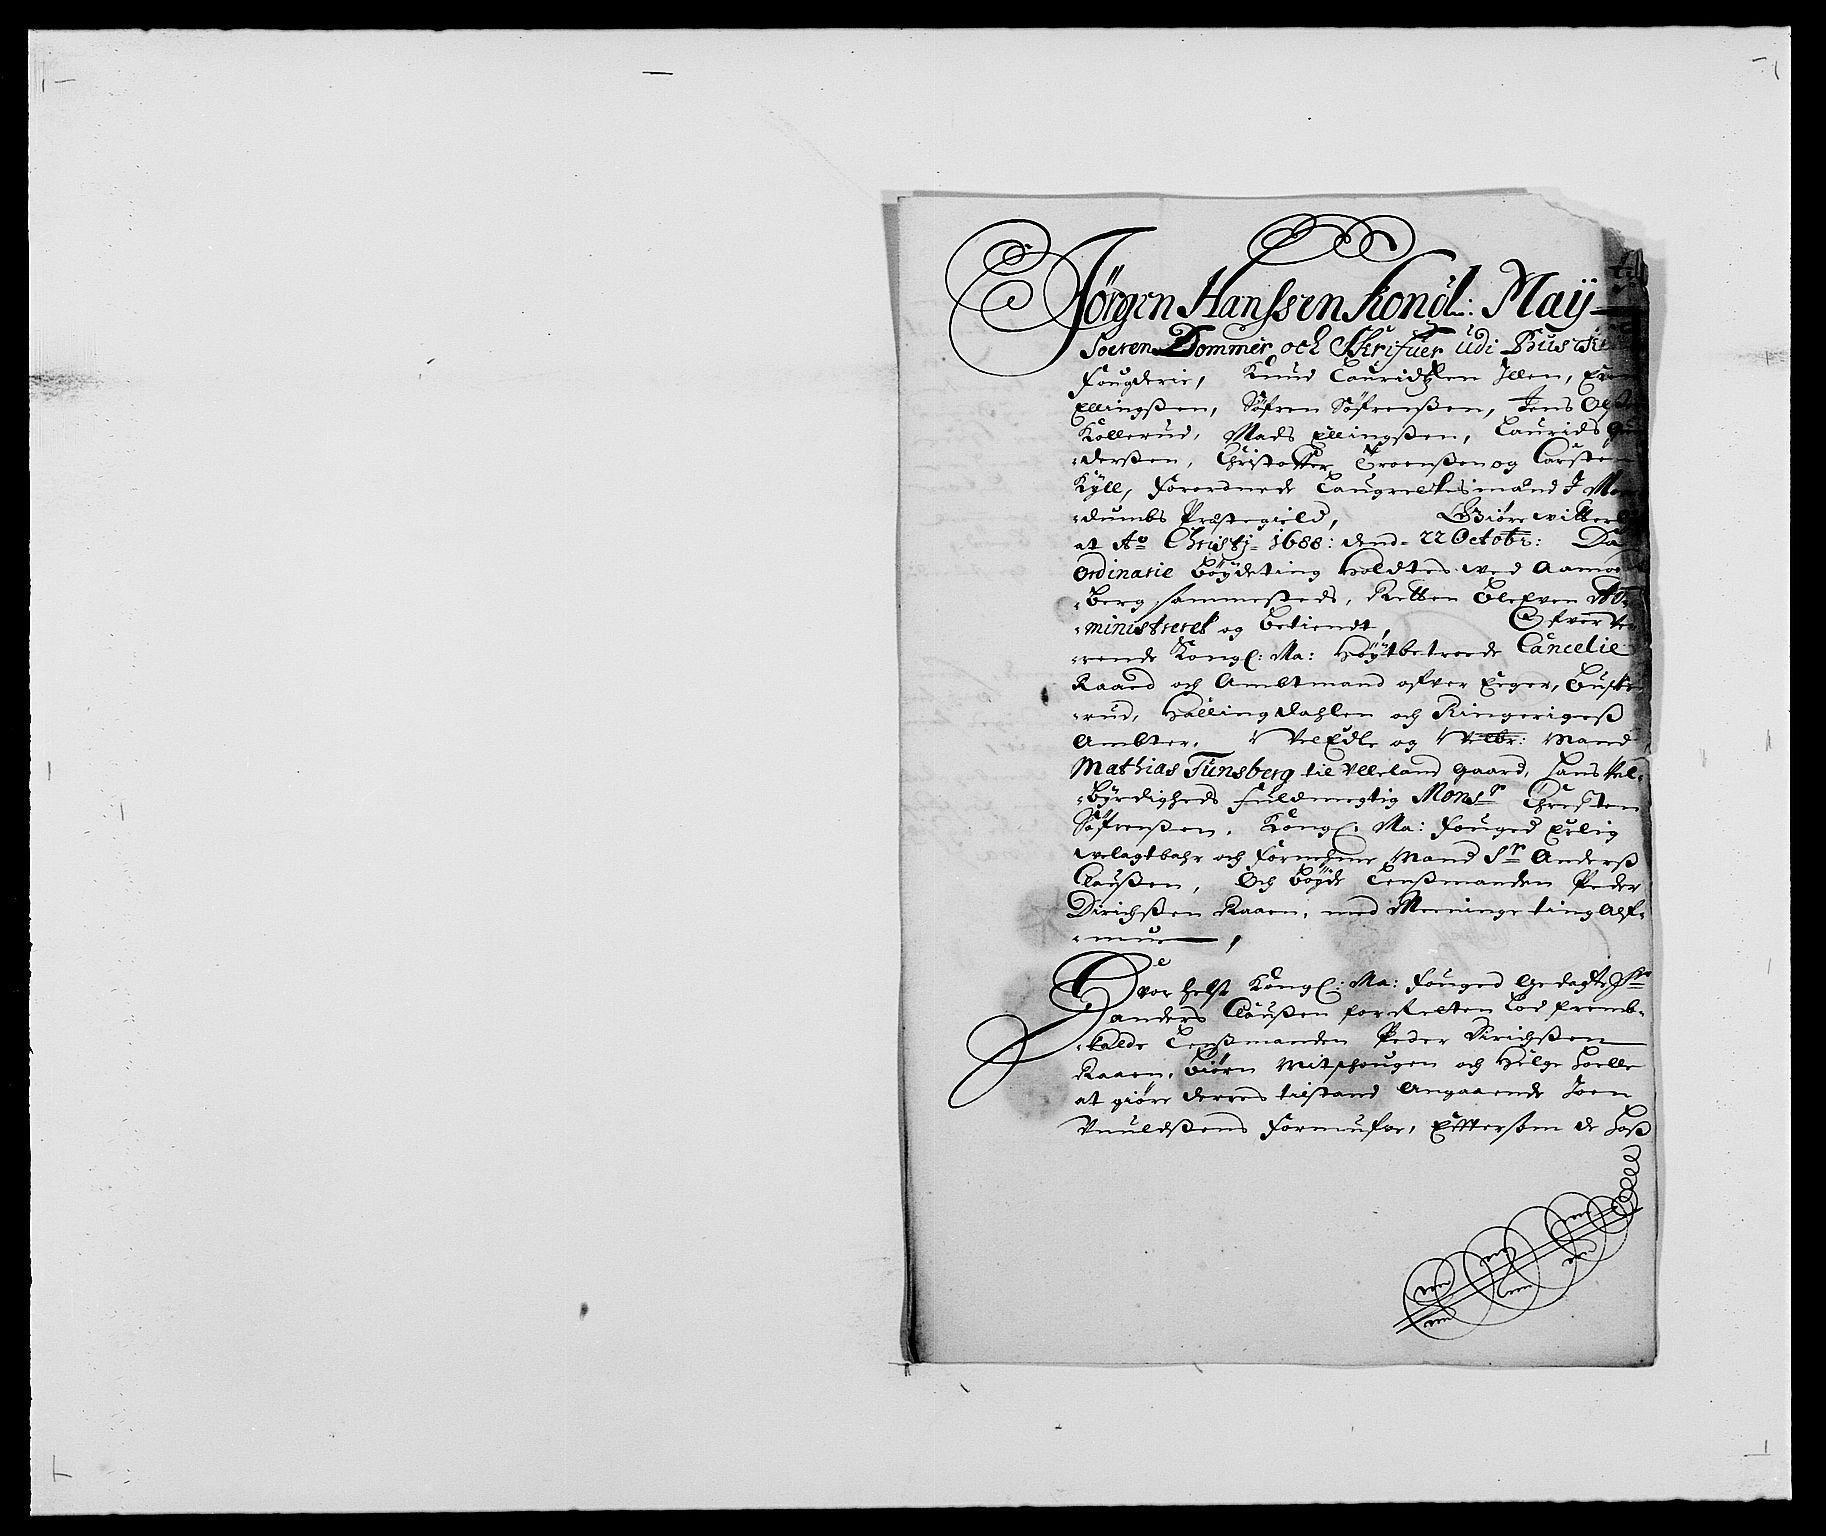 RA, Rentekammeret inntil 1814, Reviderte regnskaper, Fogderegnskap, R25/L1679: Fogderegnskap Buskerud, 1687-1688, s. 289